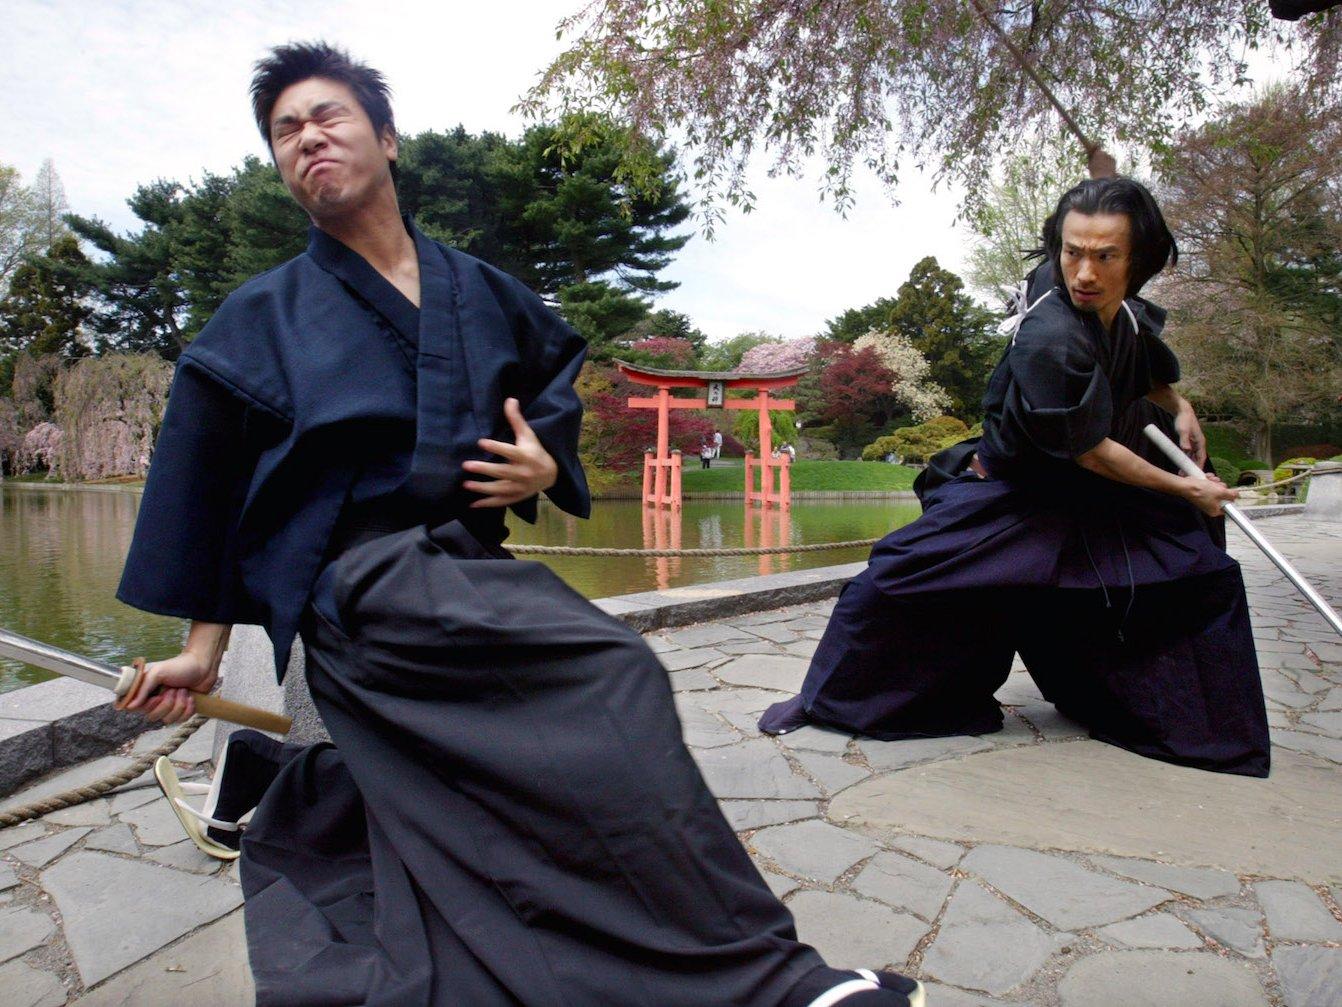 Samurai Sword Fight Play